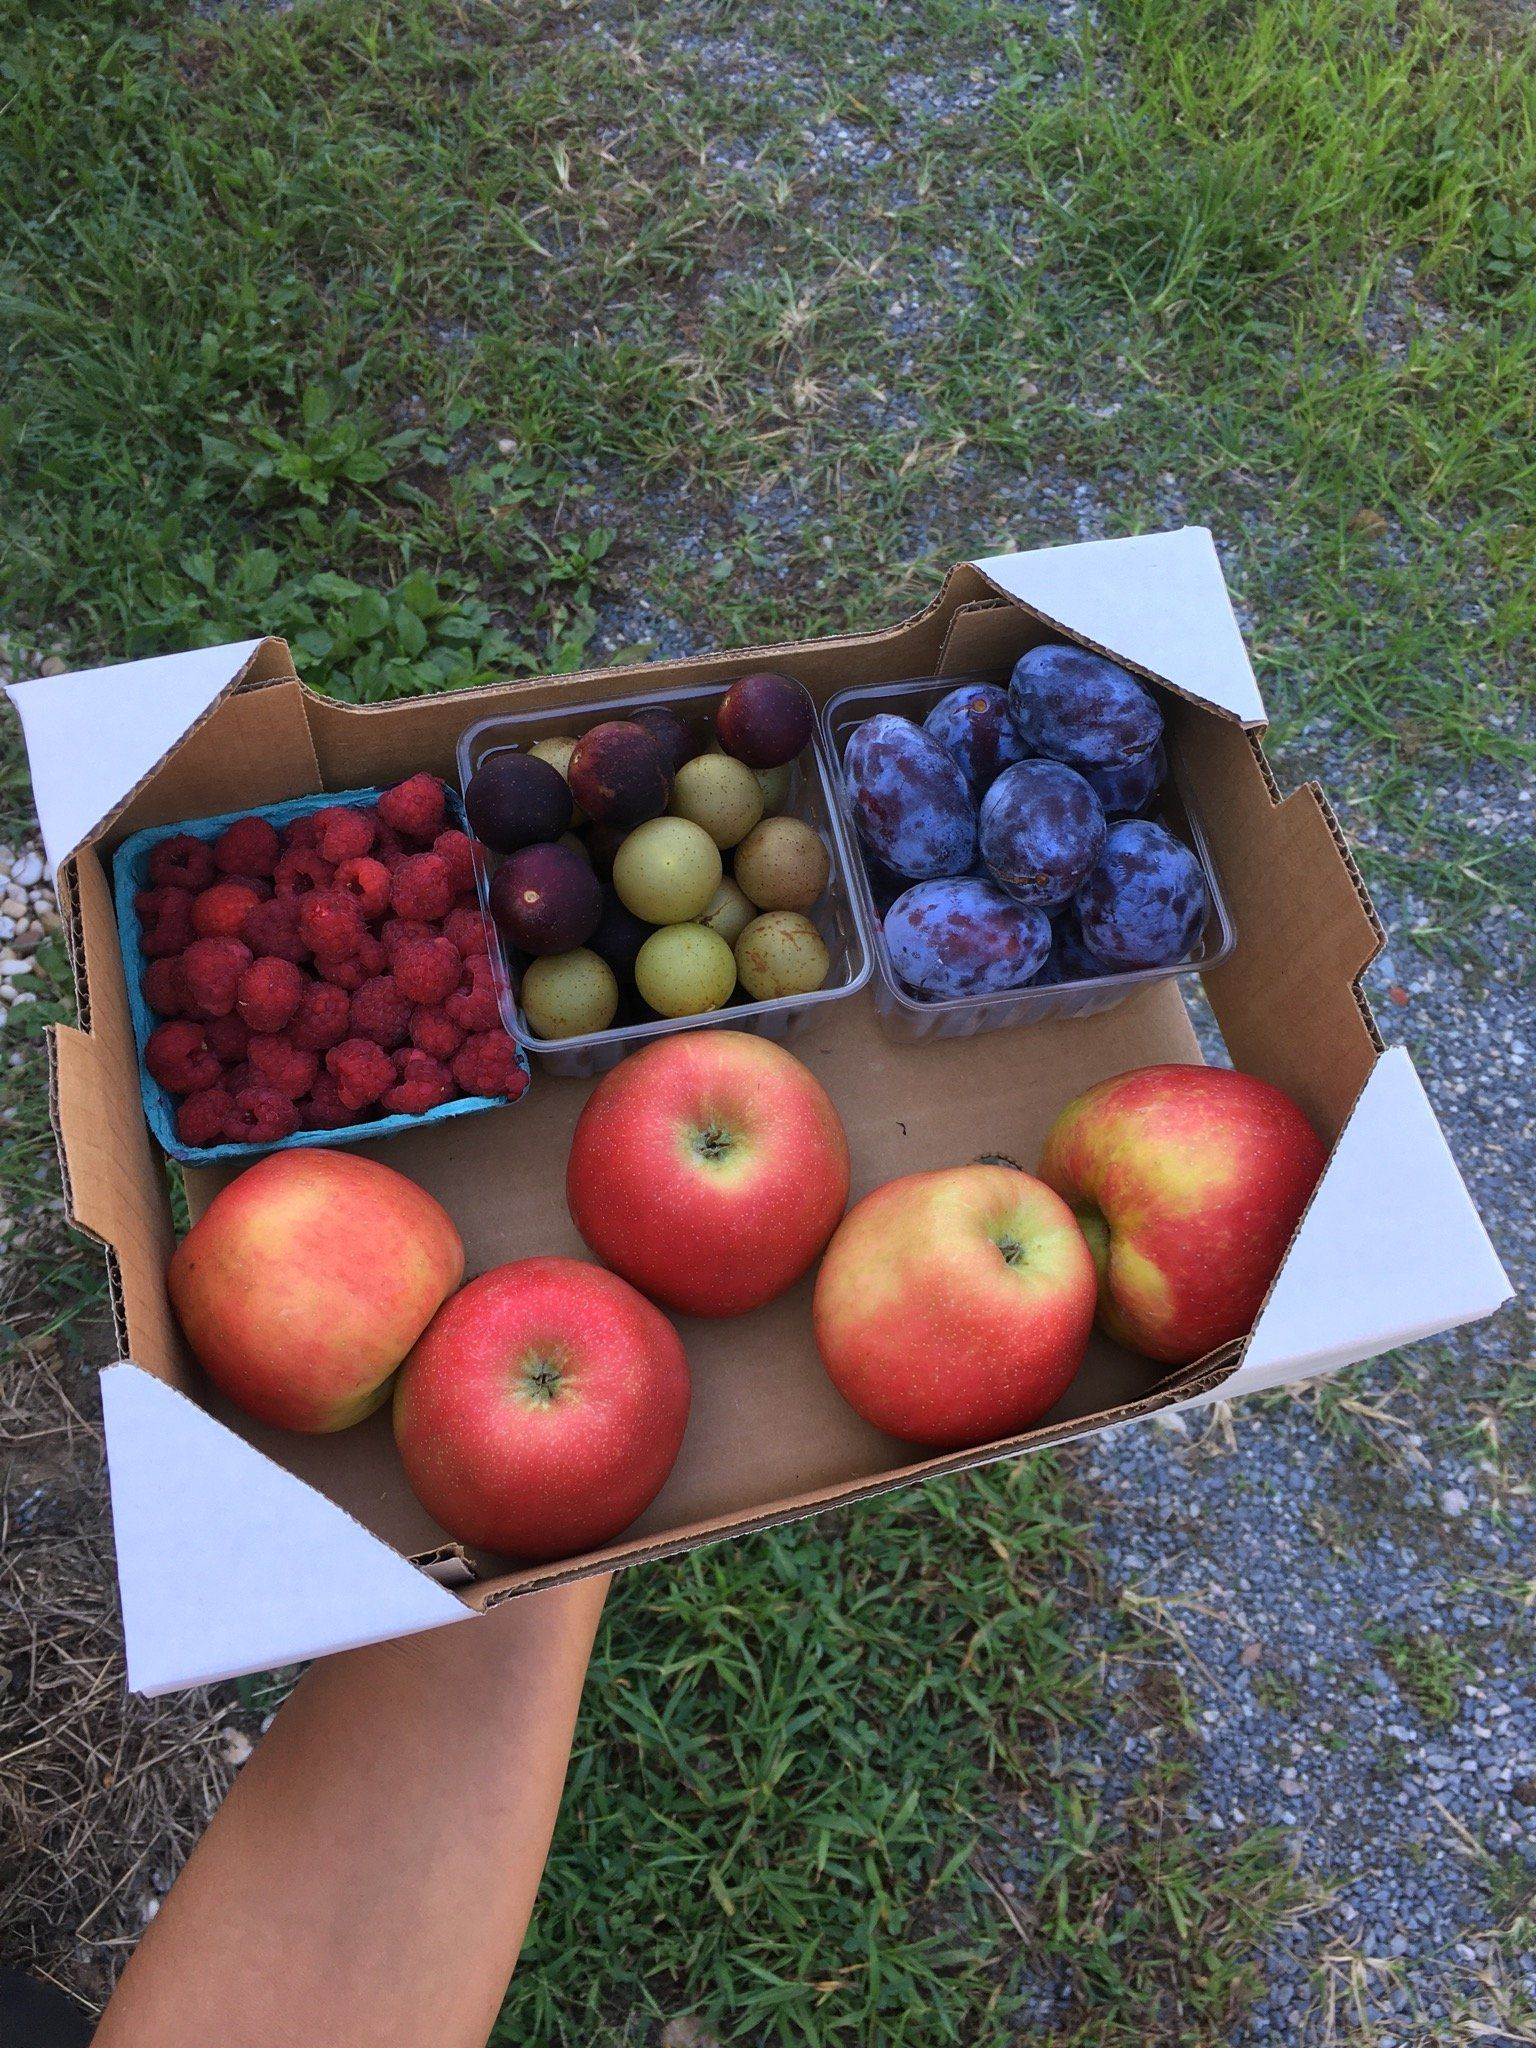 Final week of the Summer Farm Share. Next week begins the Fall Farm Share